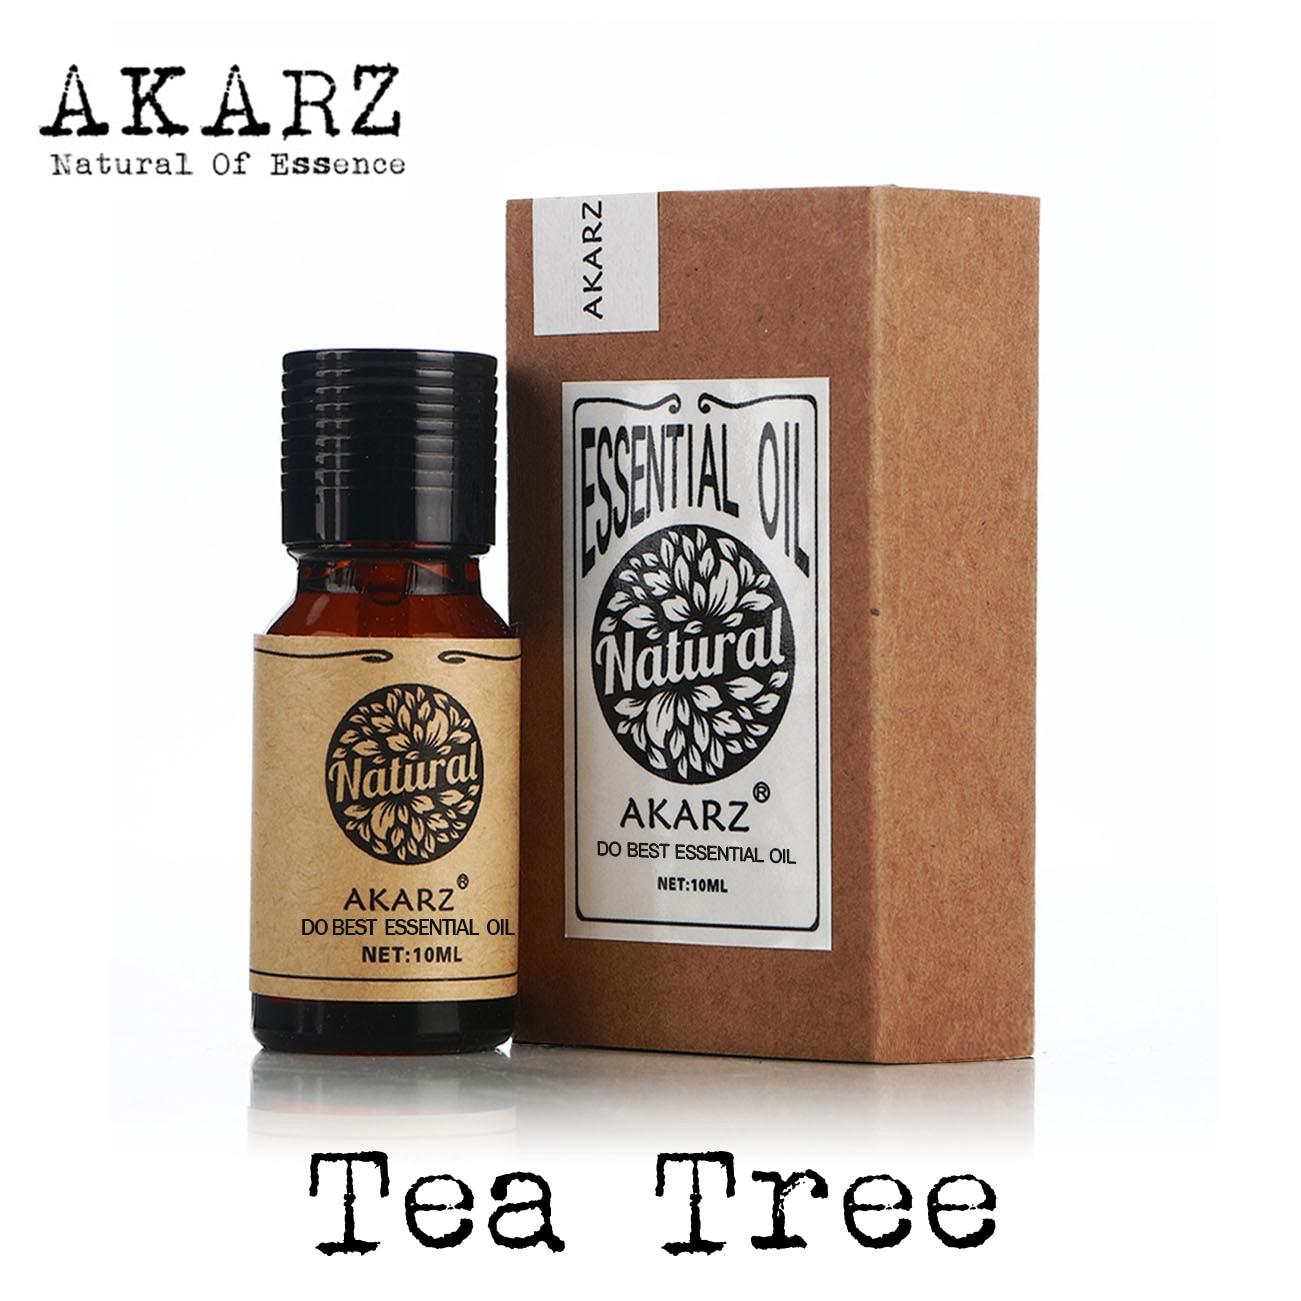 AKARZ Famous Brand TEA TREE ESSENTIAL OIL NATURAL TREATMENT FOR ADULTS ORGANIC Skin Body Massage Care TEA TREE Oil